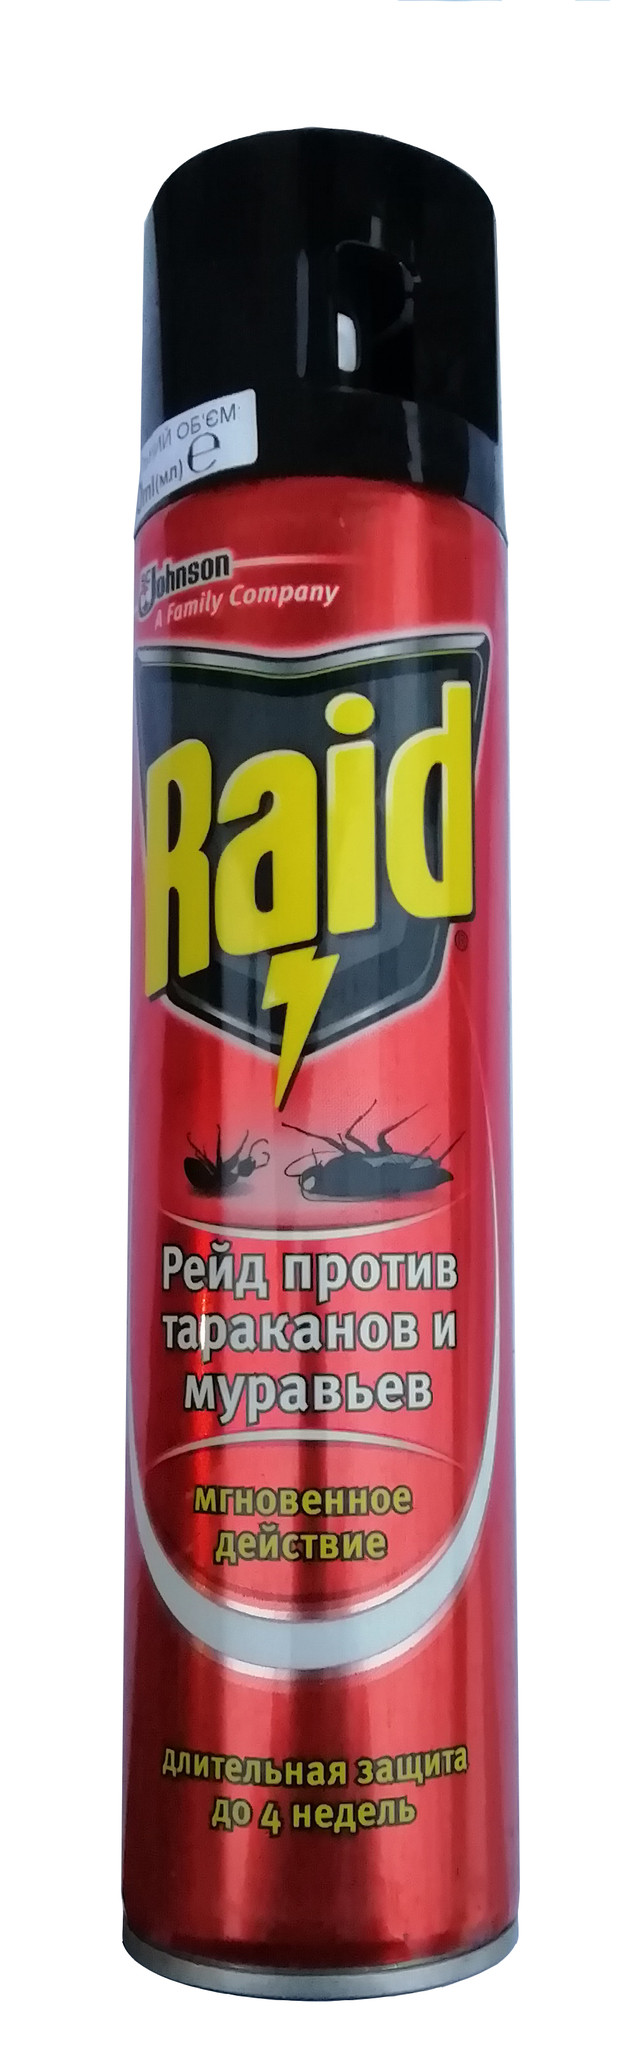 От тараканов Рэйд raid рейд оптом и в розницу optotorg.com.ua